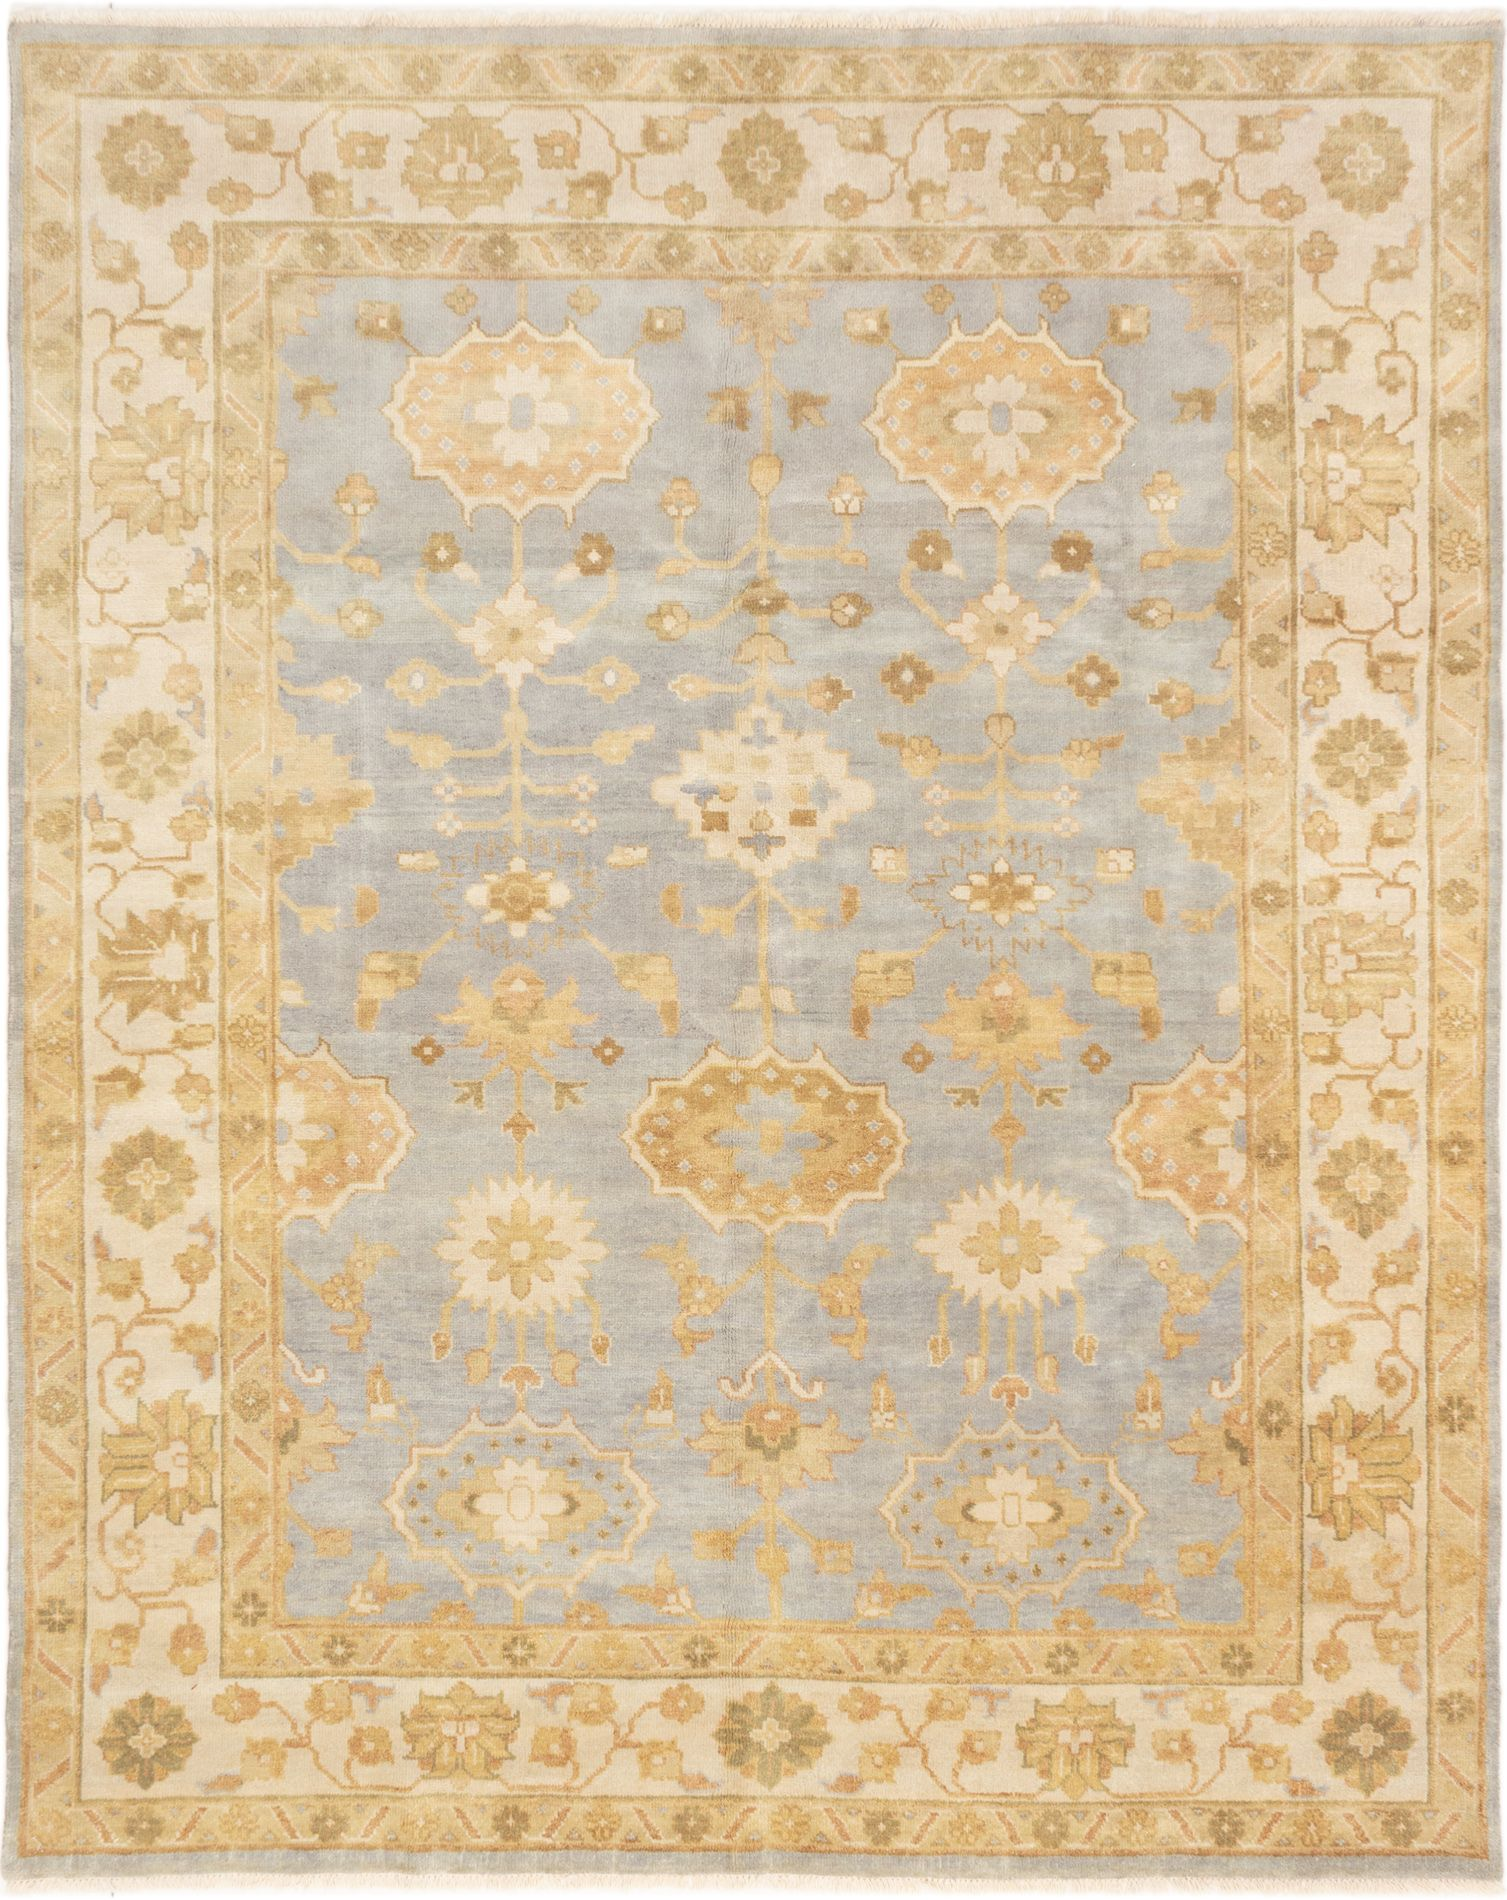 "Hand-knotted Finest Ushak Light Blue  Wool Rug 8'2"" x 10'2"" Size: 8'2"" x 10'2"""